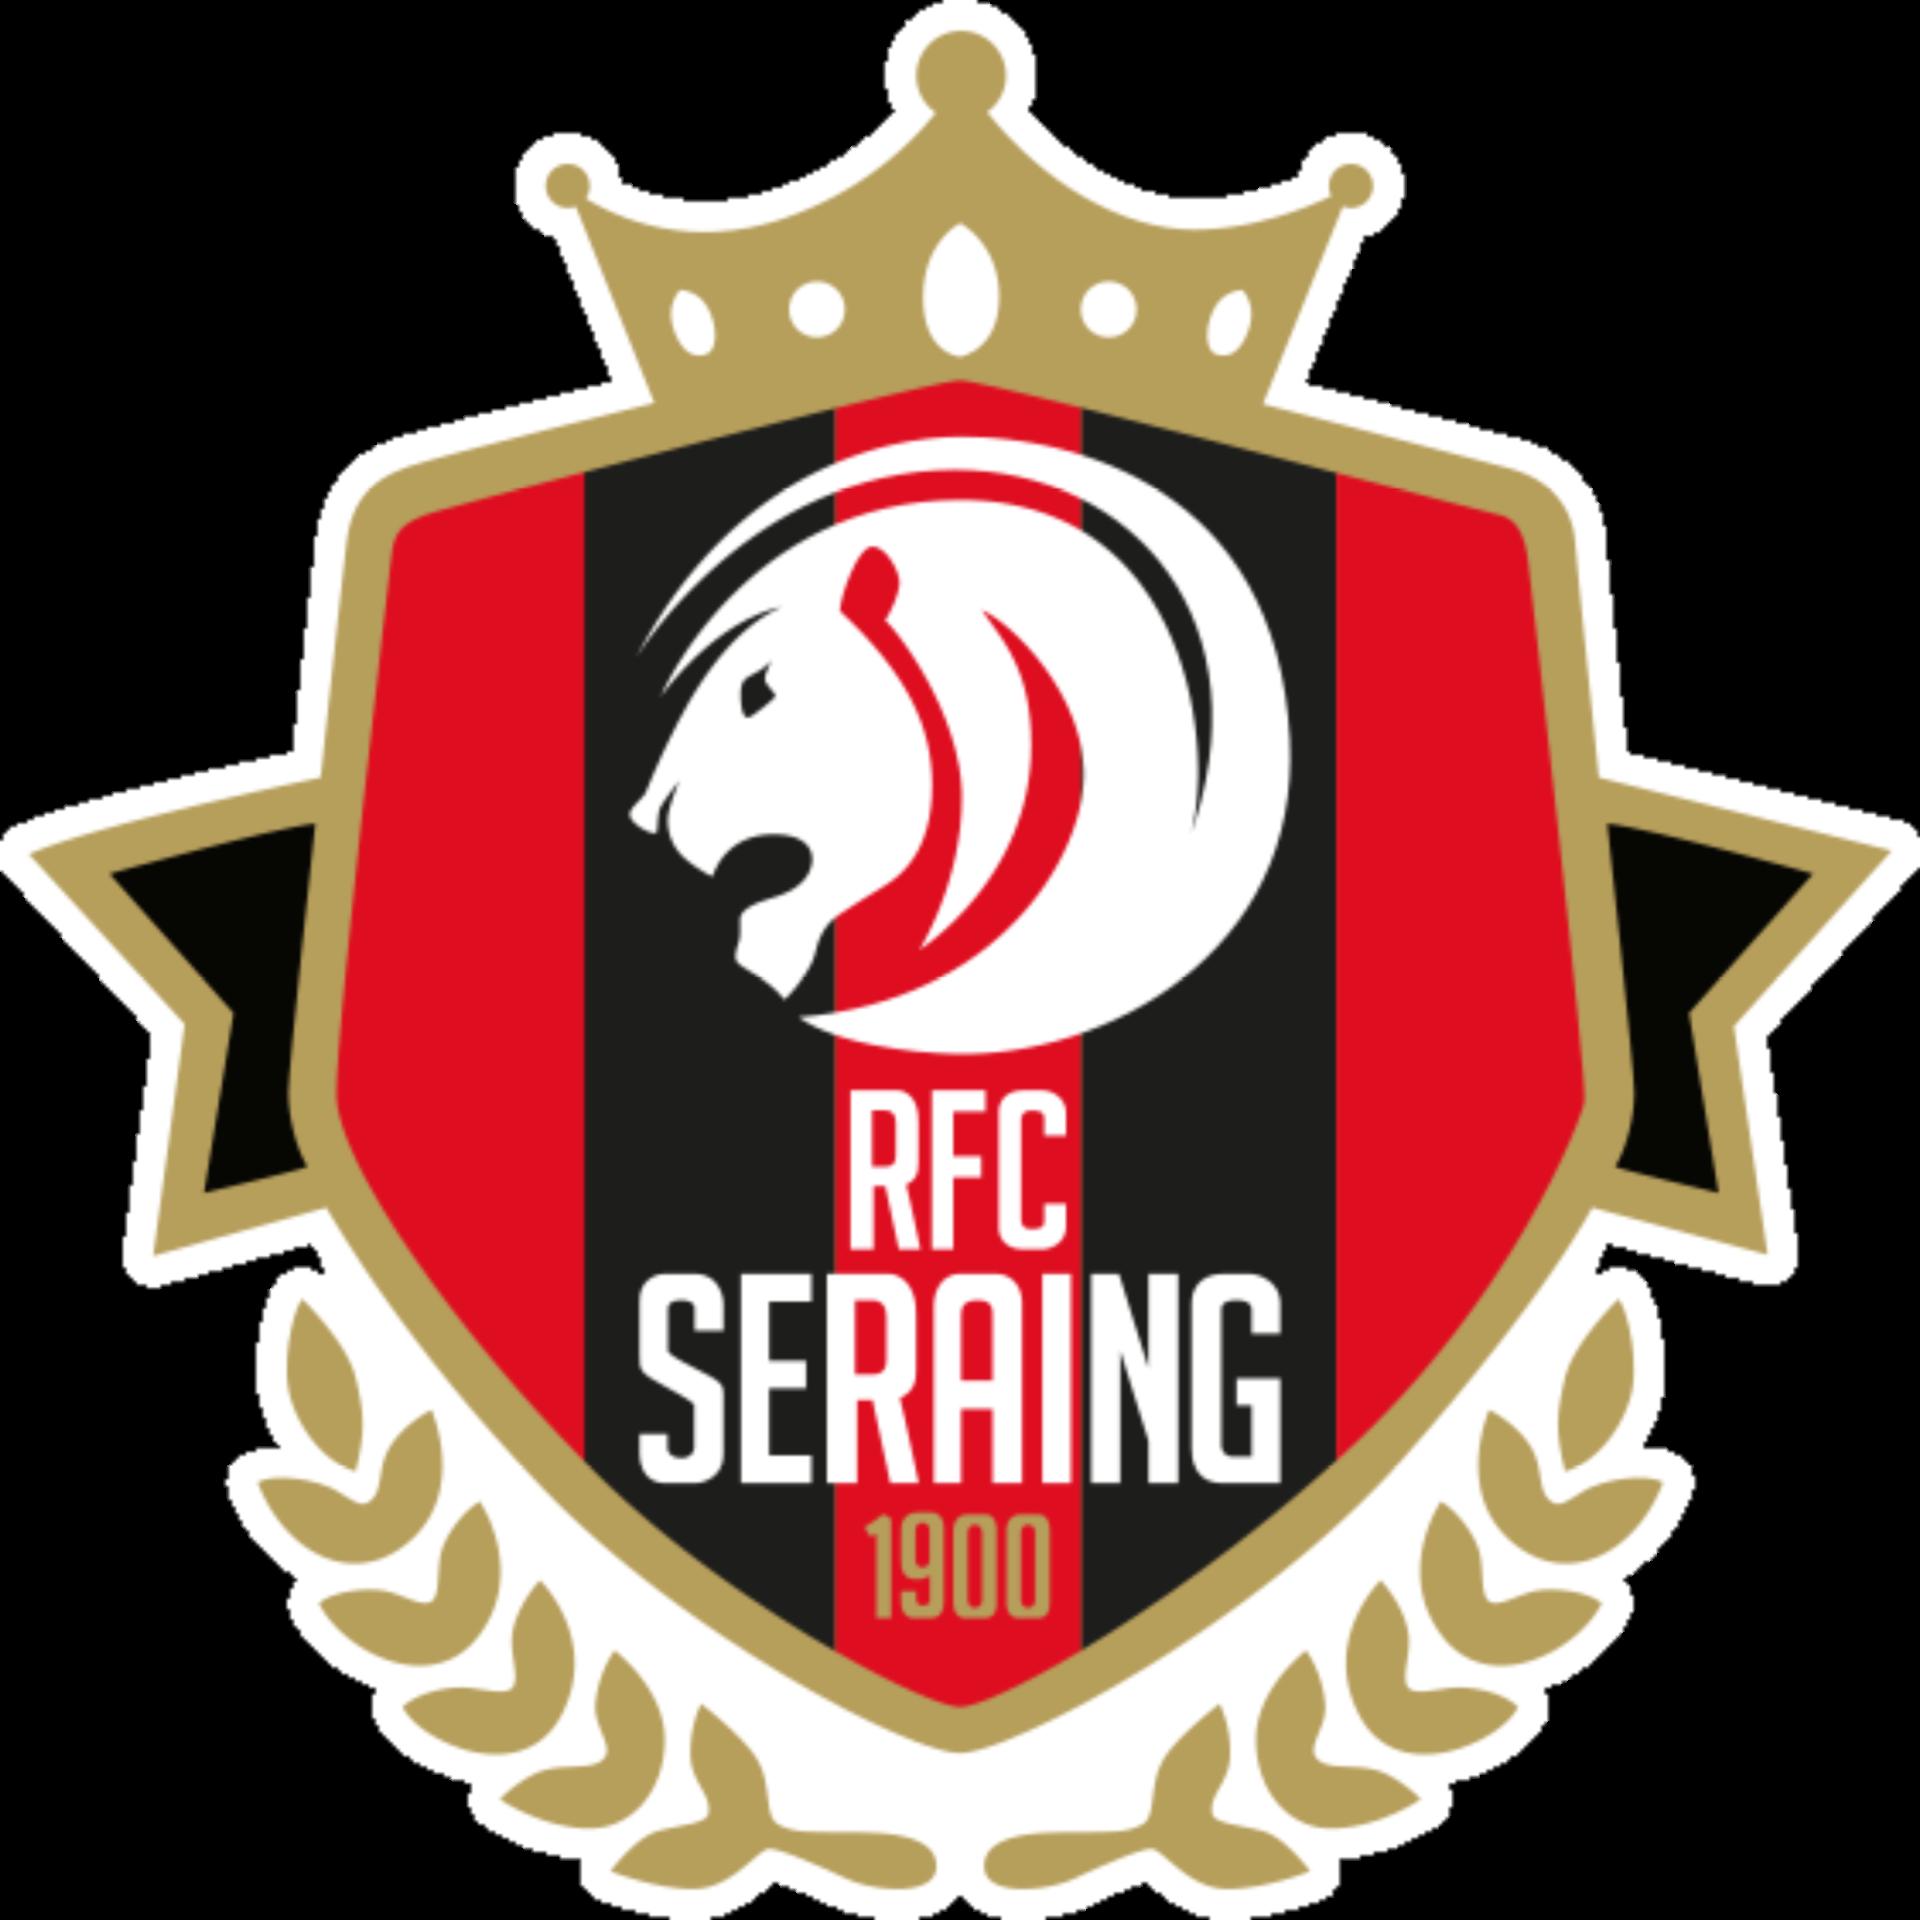 RFCSeraing